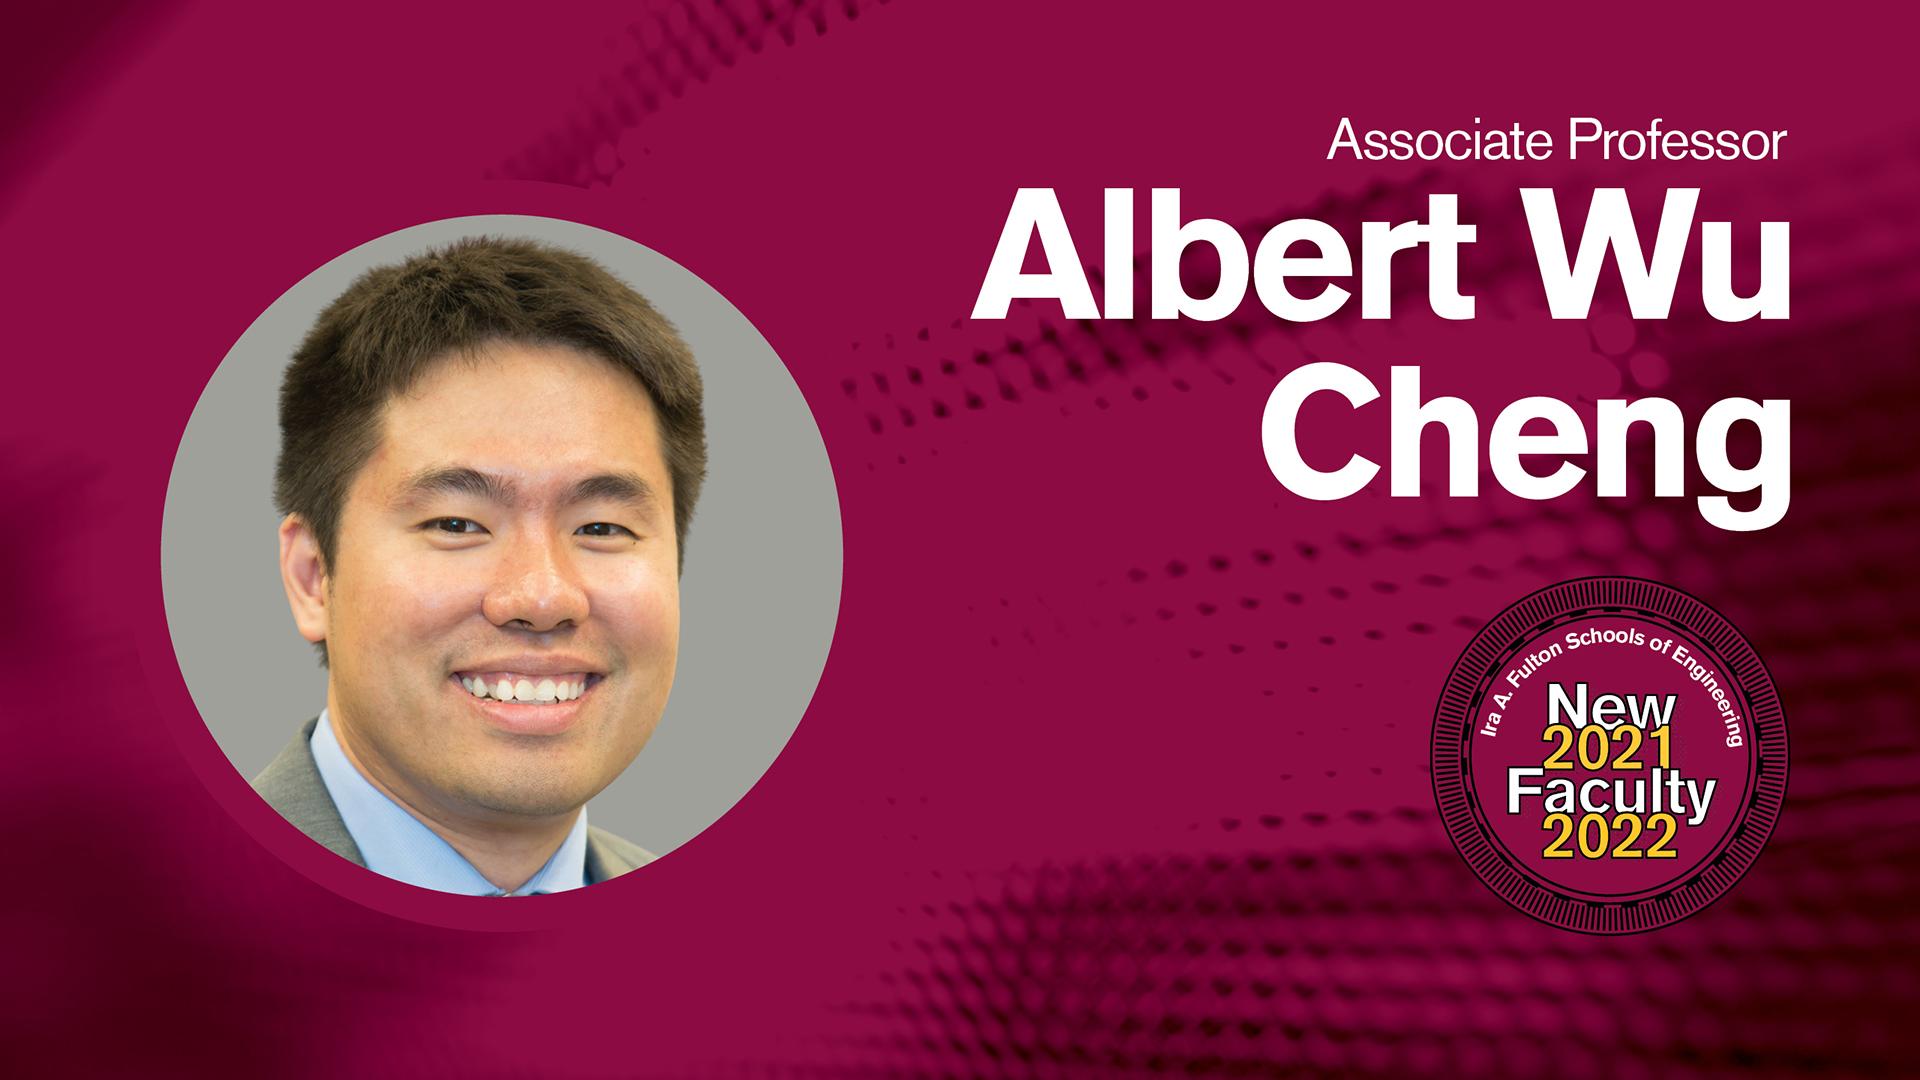 Albert Wu Cheng